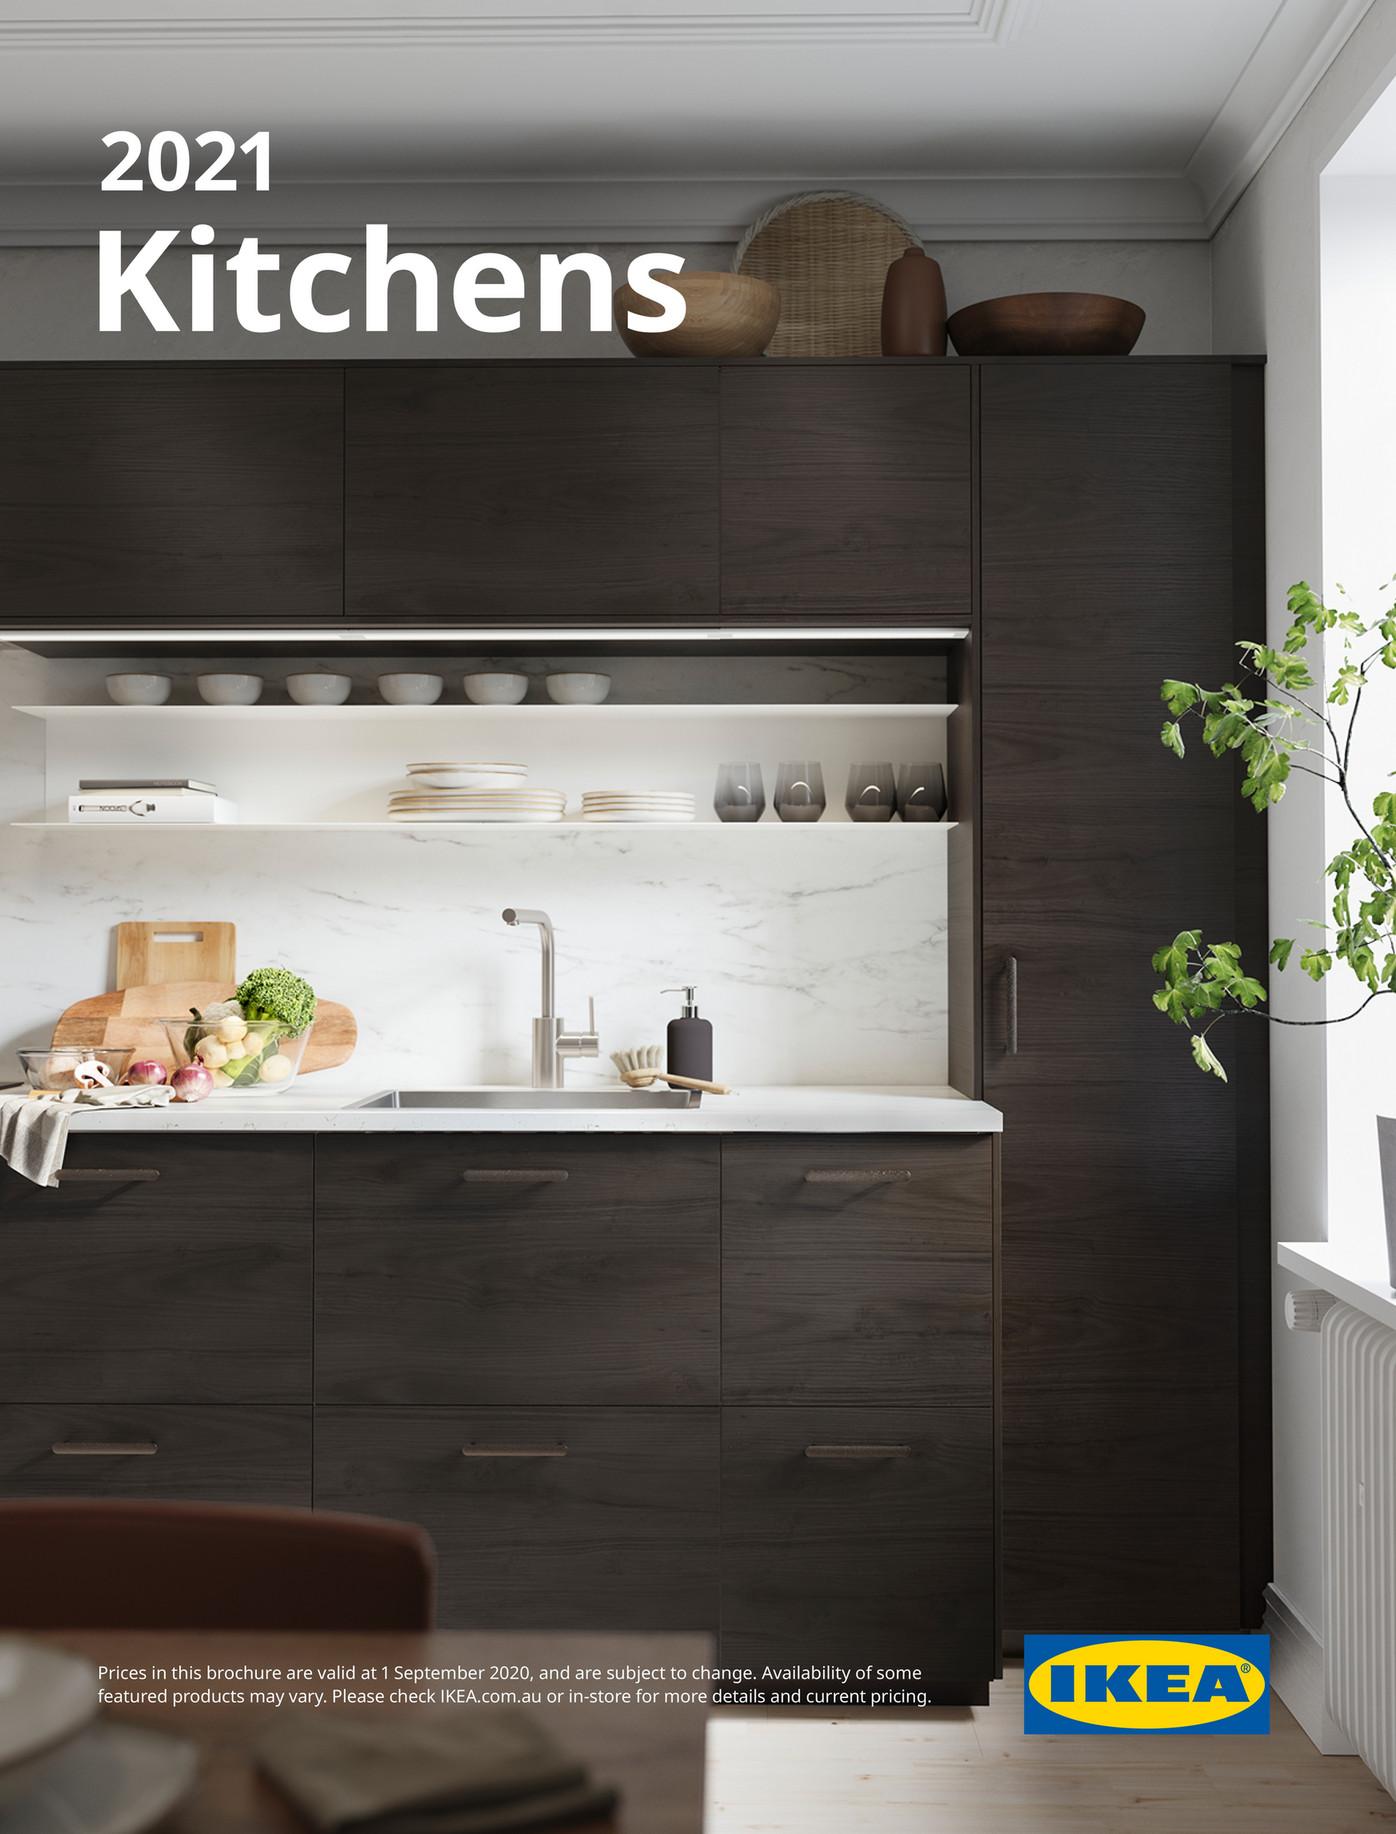 IKEA Kitchens brochure 8 - Page 8